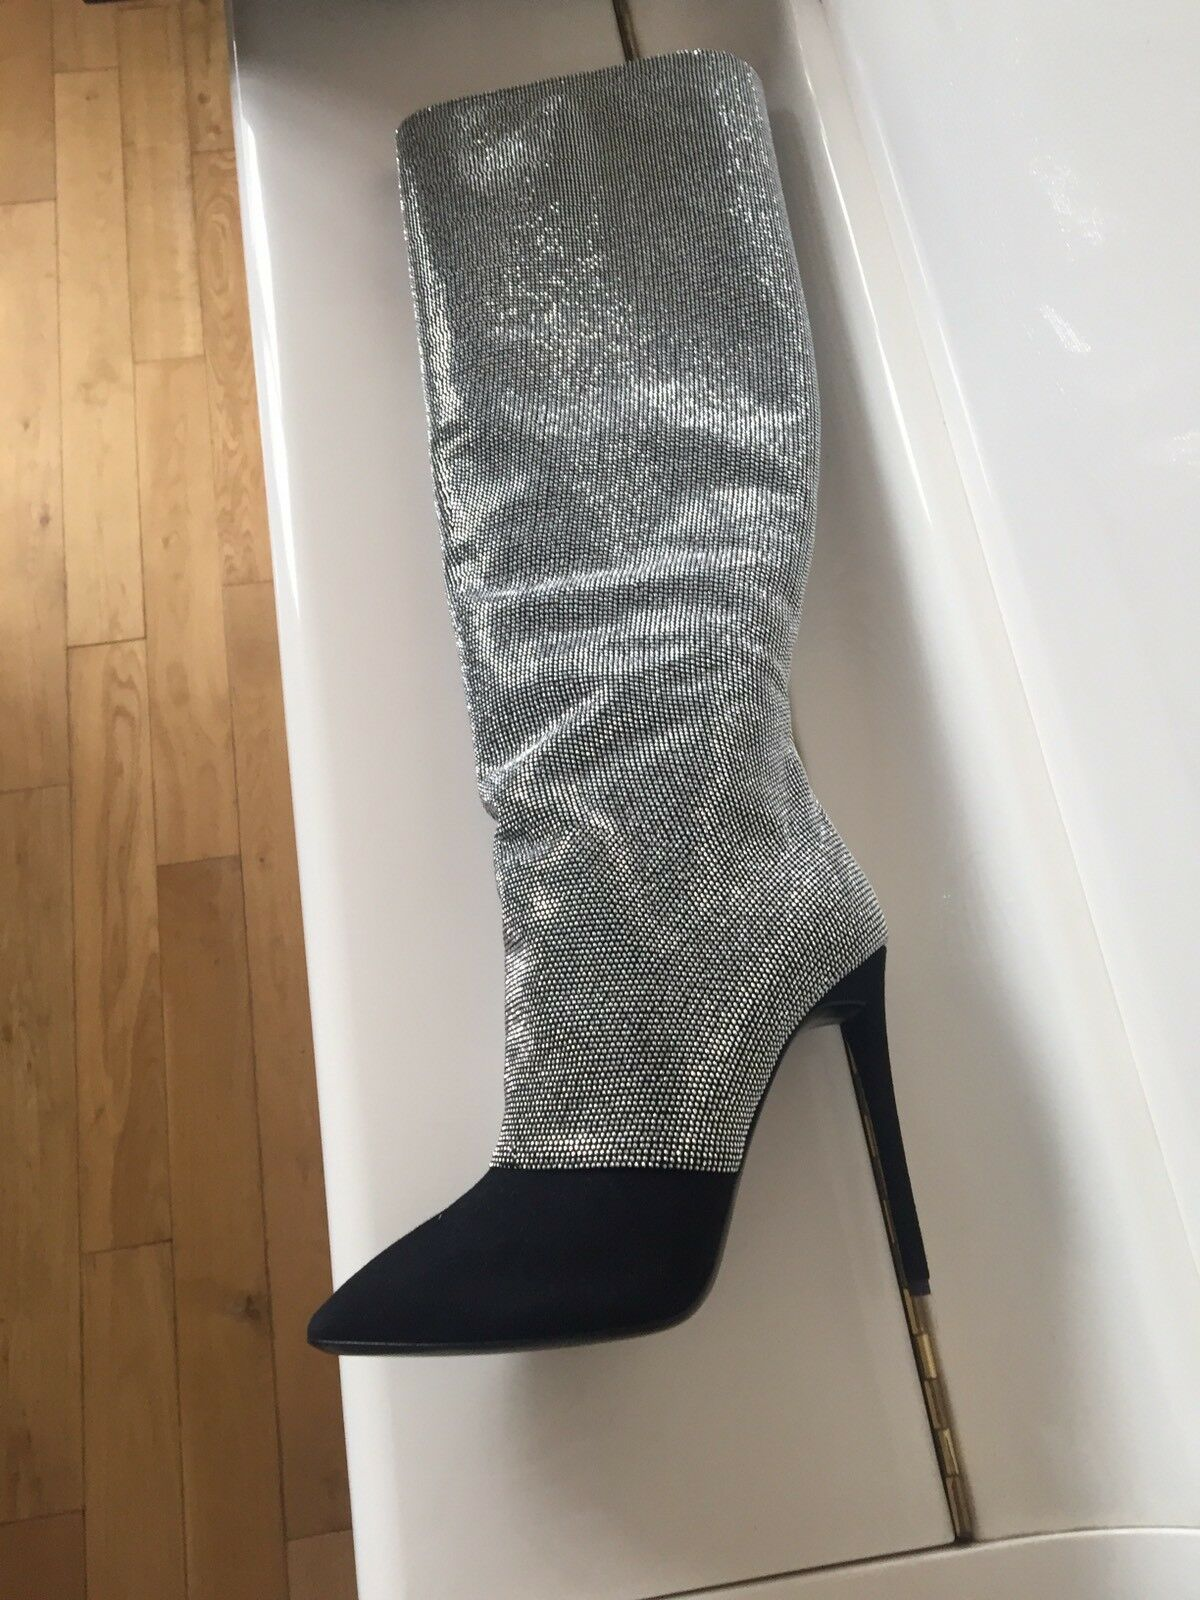 Giuzeppe ZANOTTI Stivali con cristalli svarovski misura IT 37,5